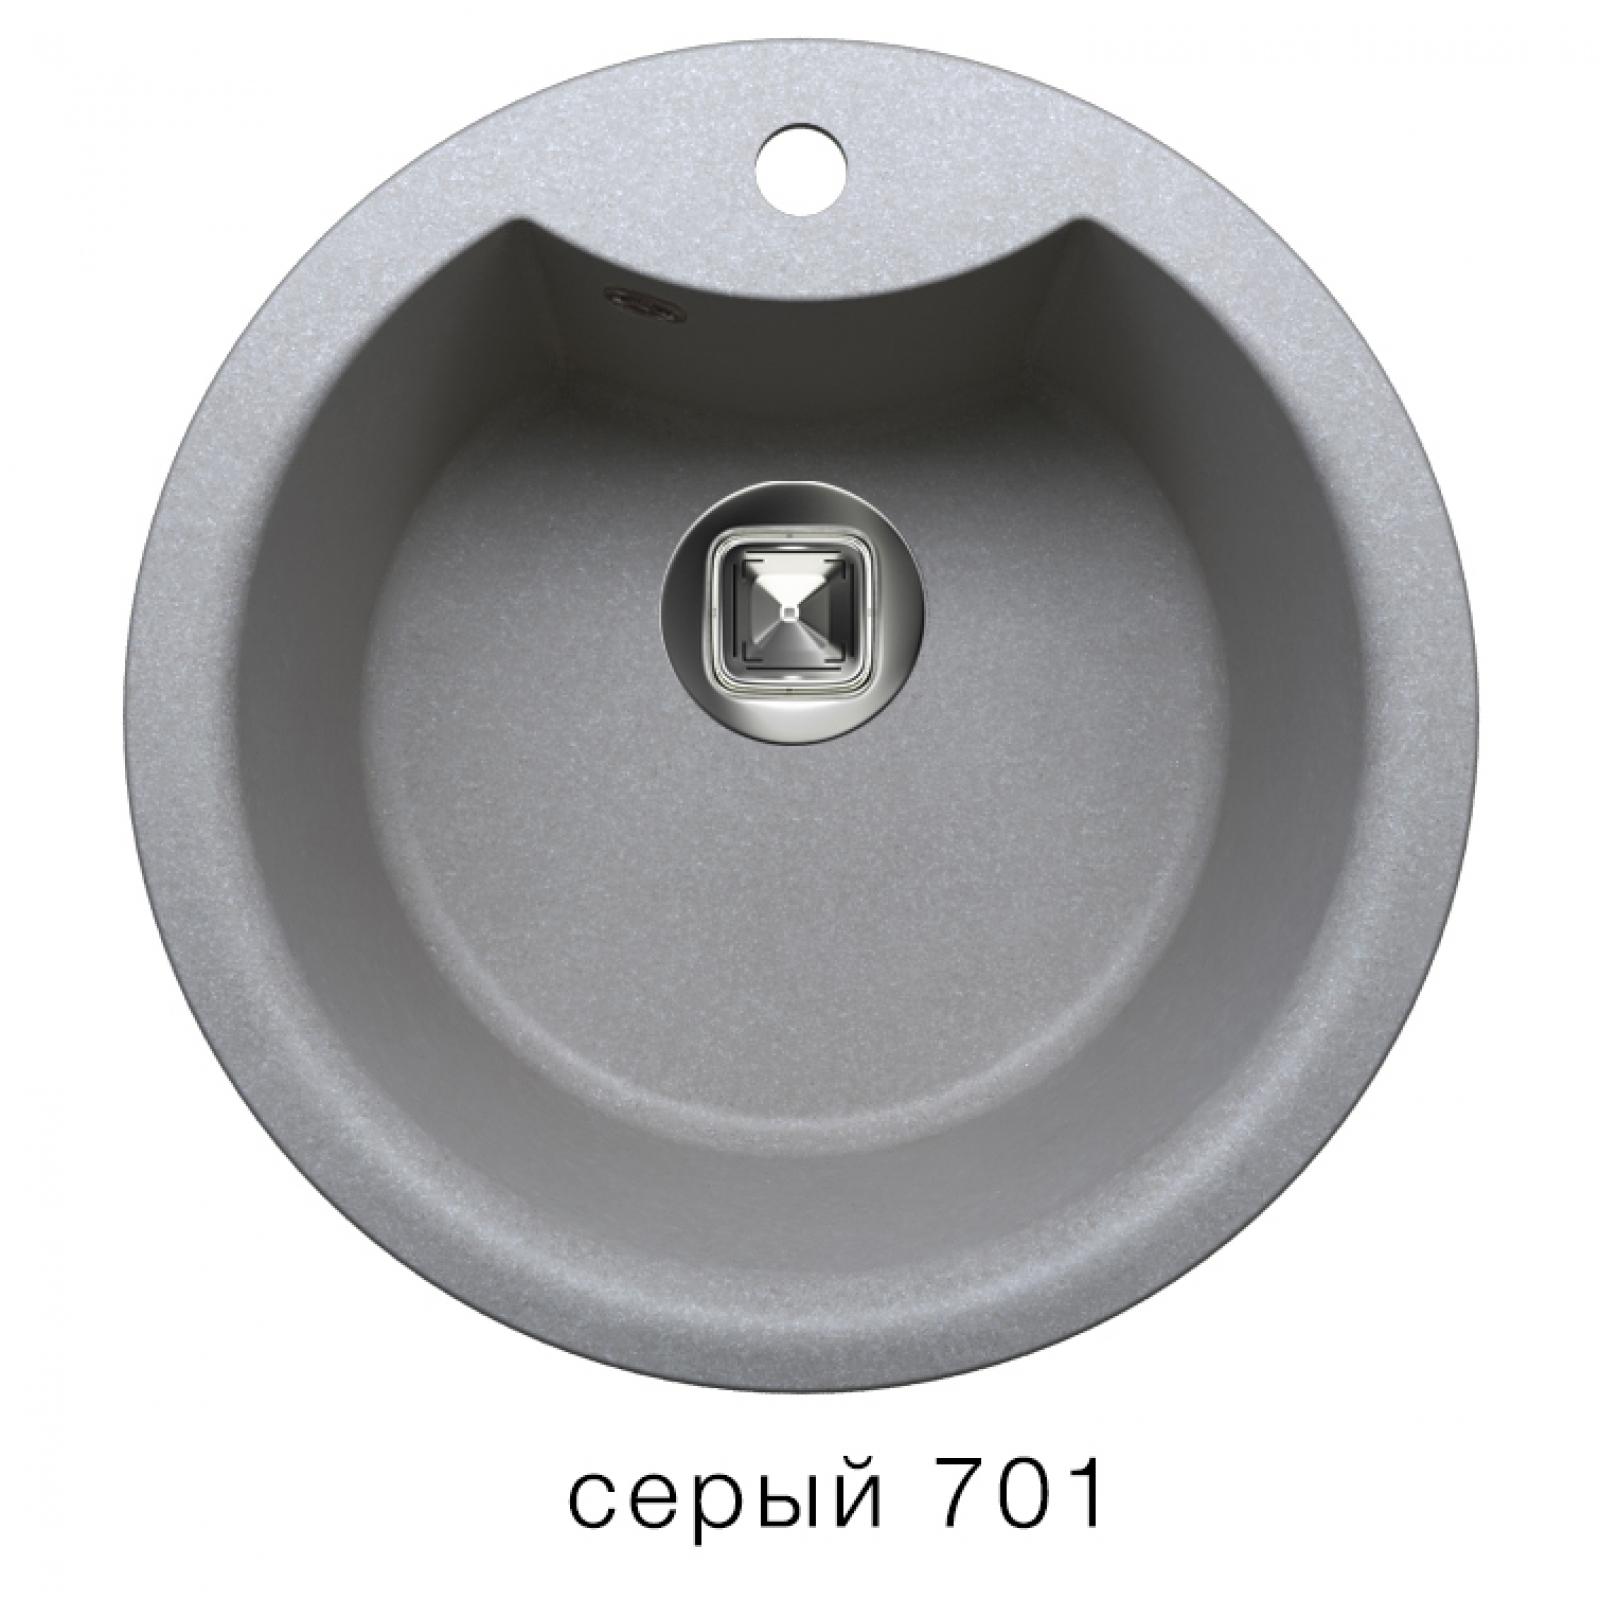 Мойка Tolero-R-108e-701, цвет - Серый